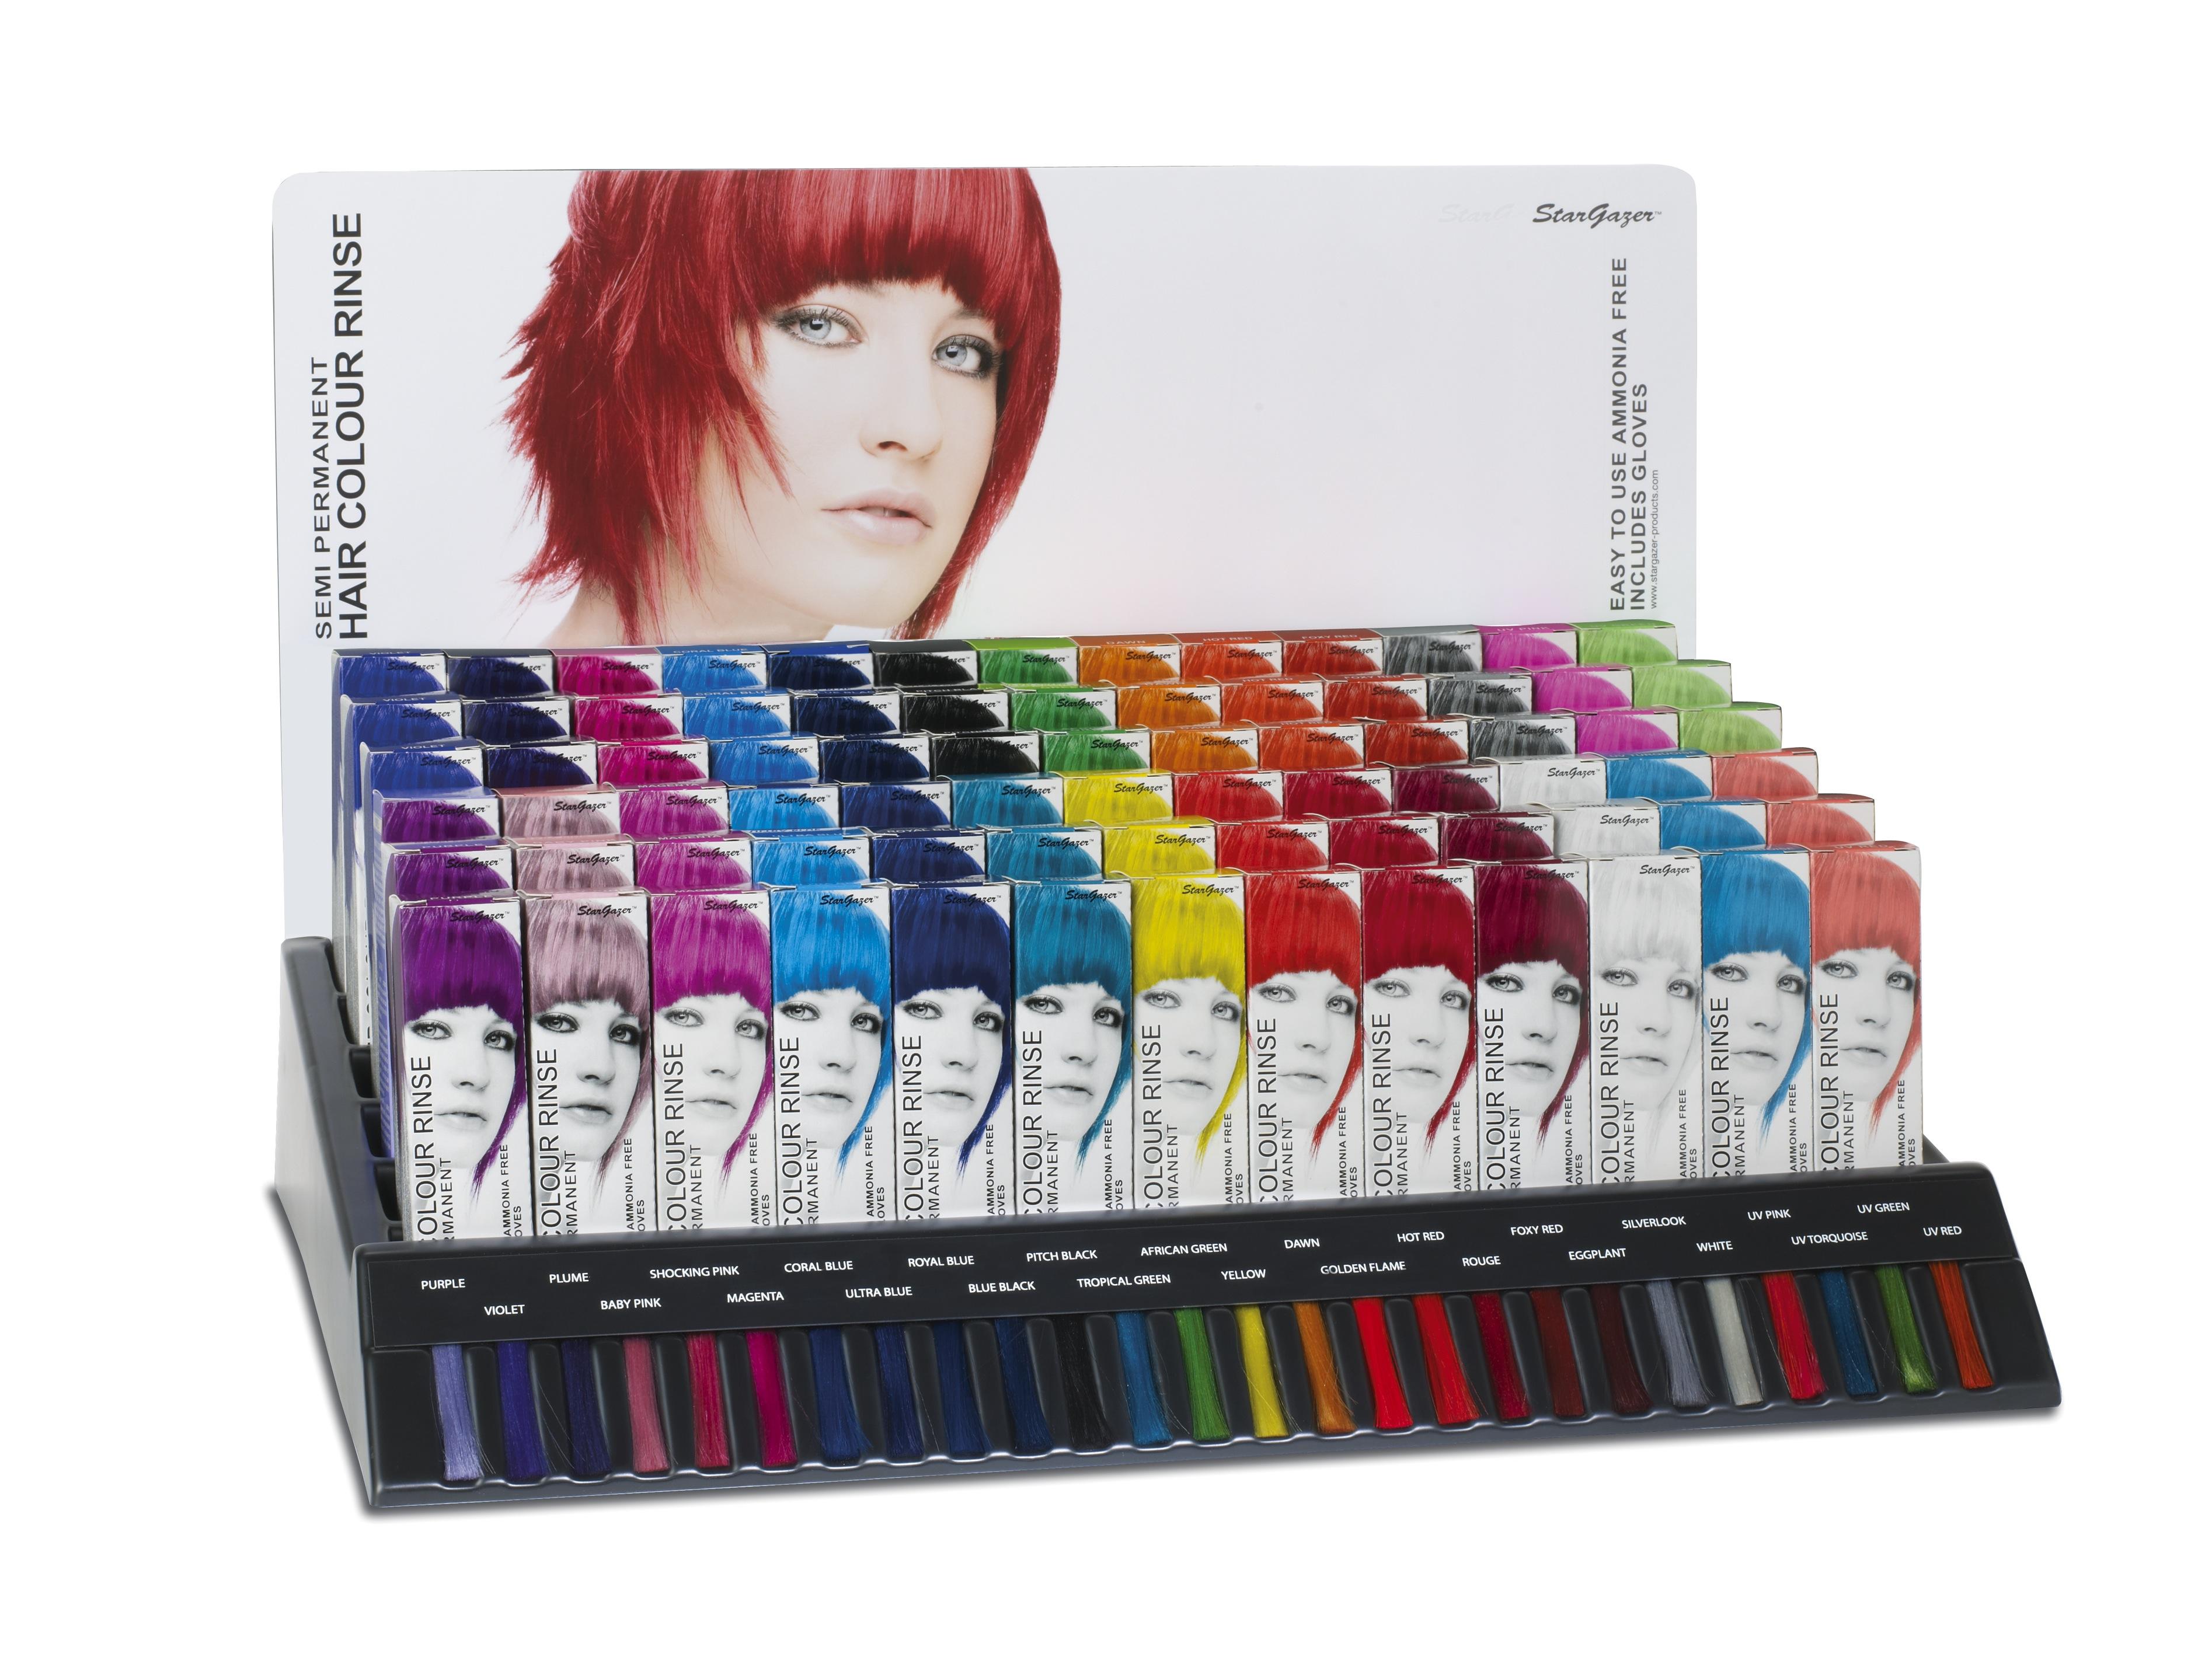 StarGazer Hair Colour Rinse Leerdisplay